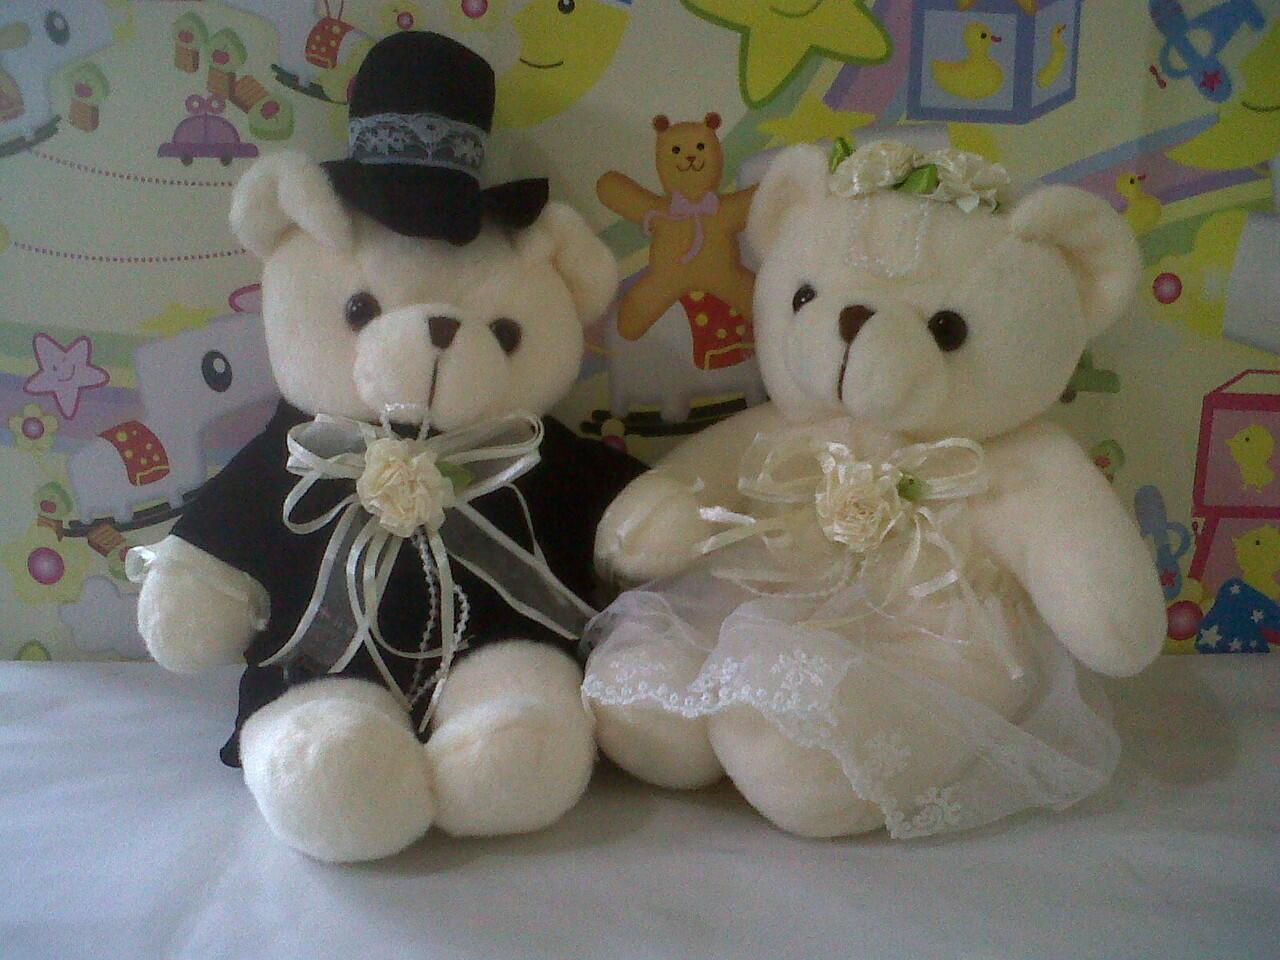 Terjual BONEKA BEAR PENGANTIN - BONEKA BEAR WEDDING - BONEKA COUPLE ... 8109800a80